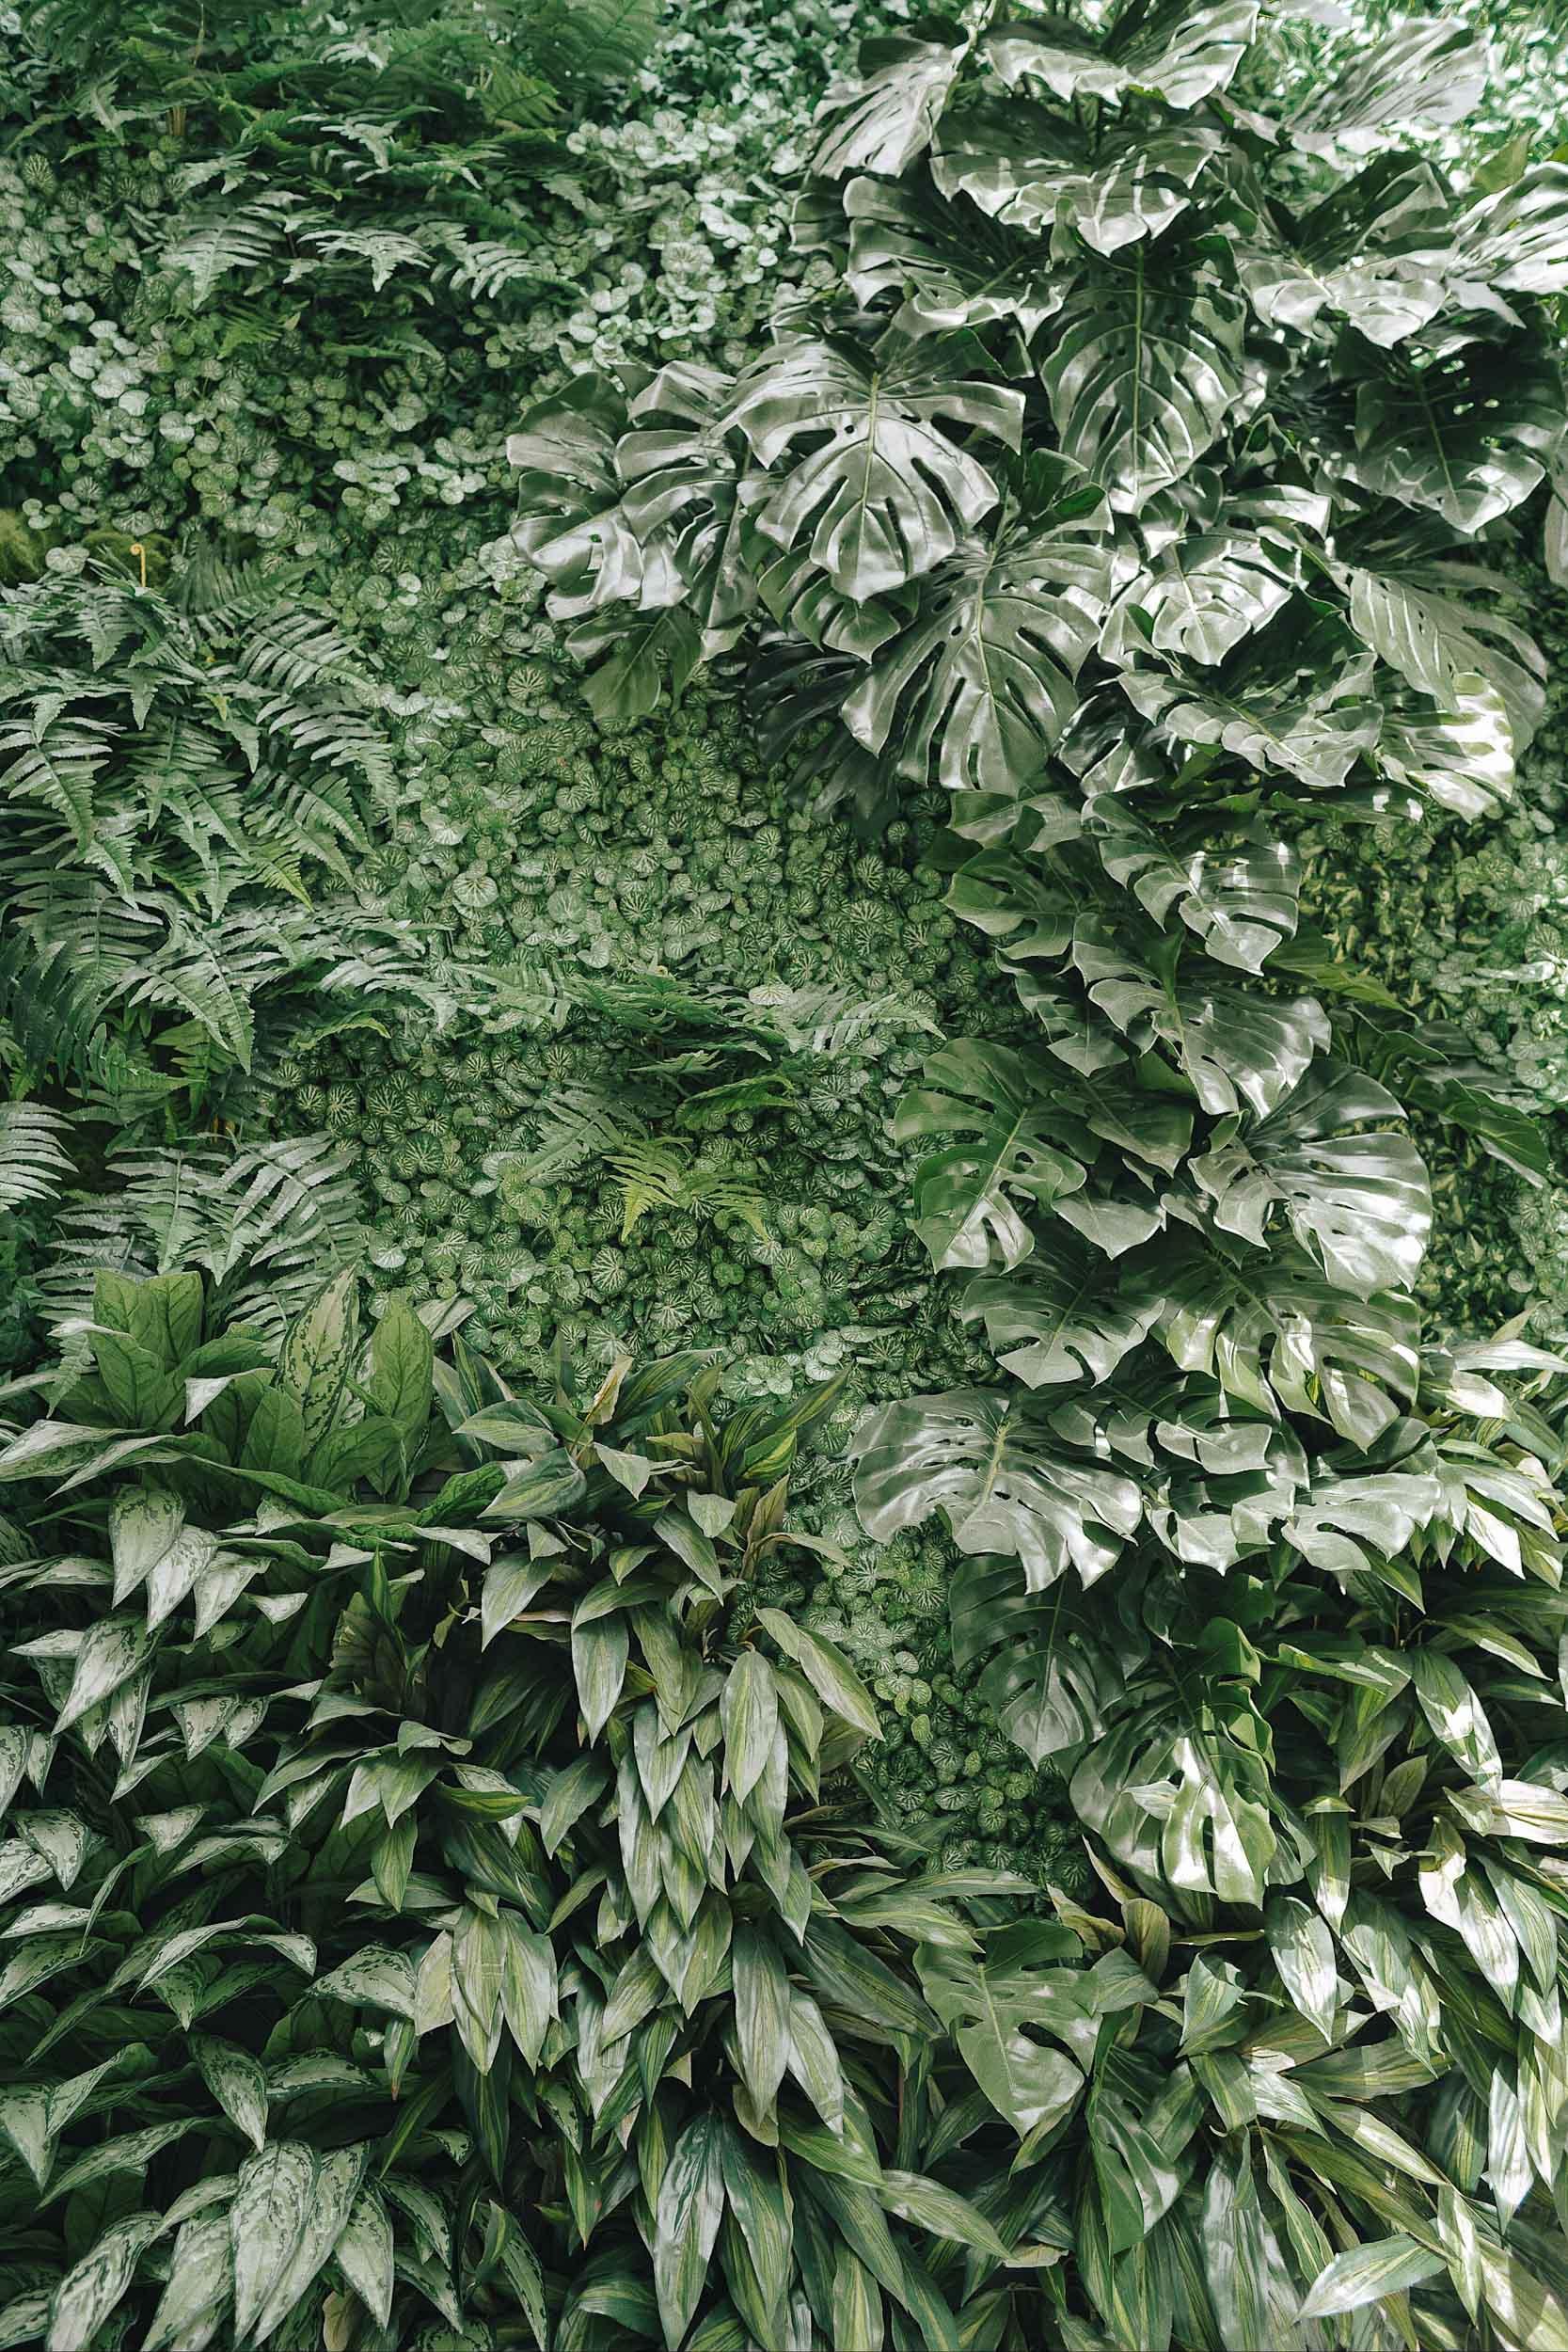 A pretty plant wall at The Hoxton Paris